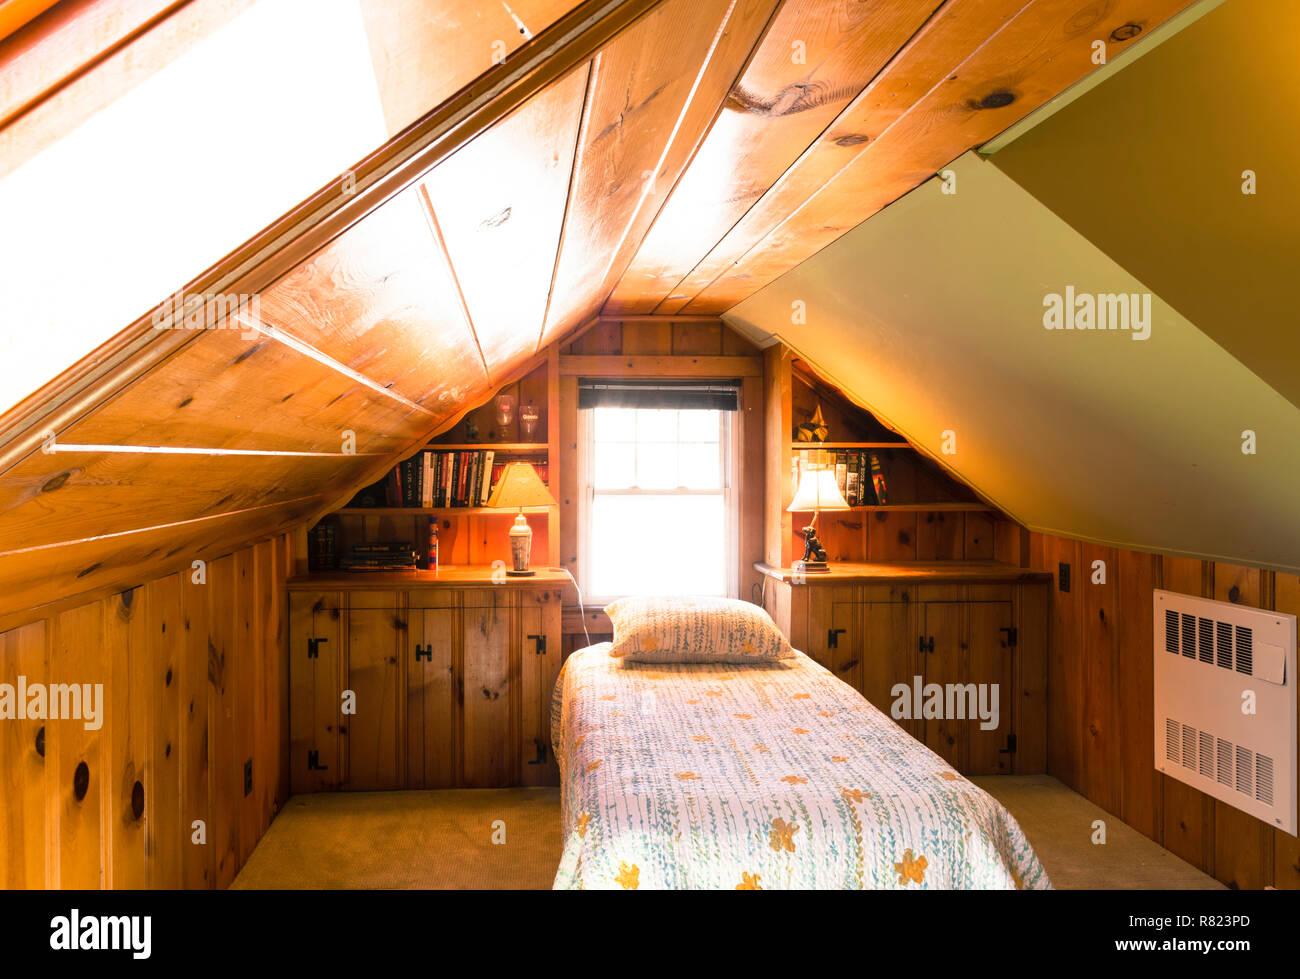 Bedroom Interior, USA - Stock Image